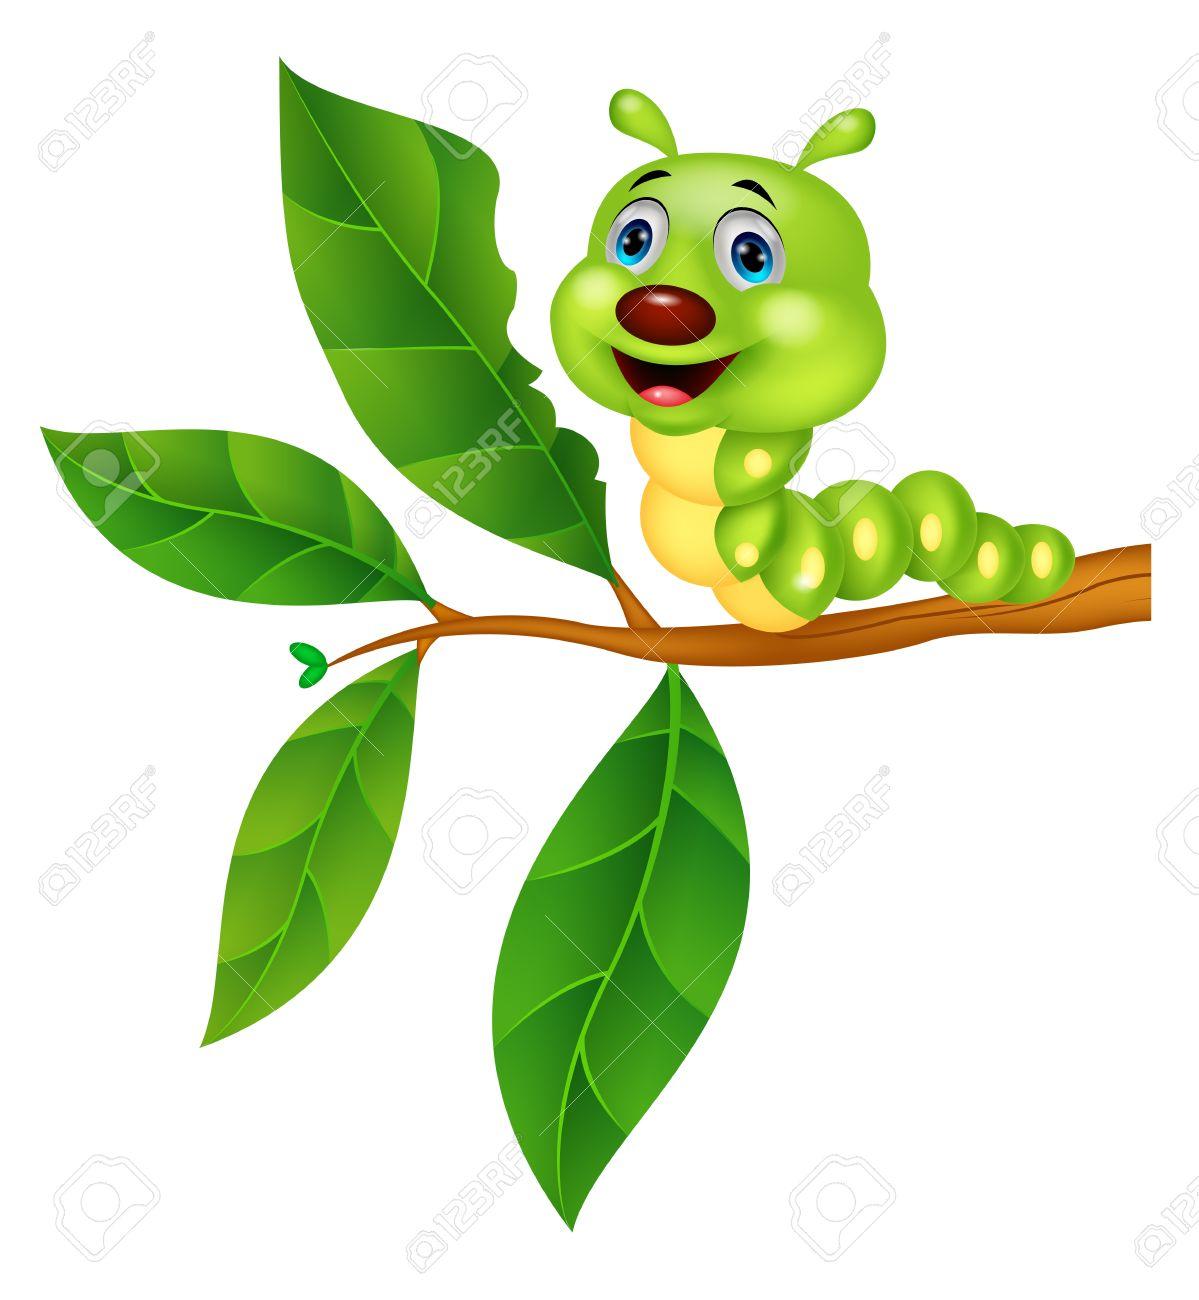 cute caterpillar cartoon eating leaf royalty free cliparts